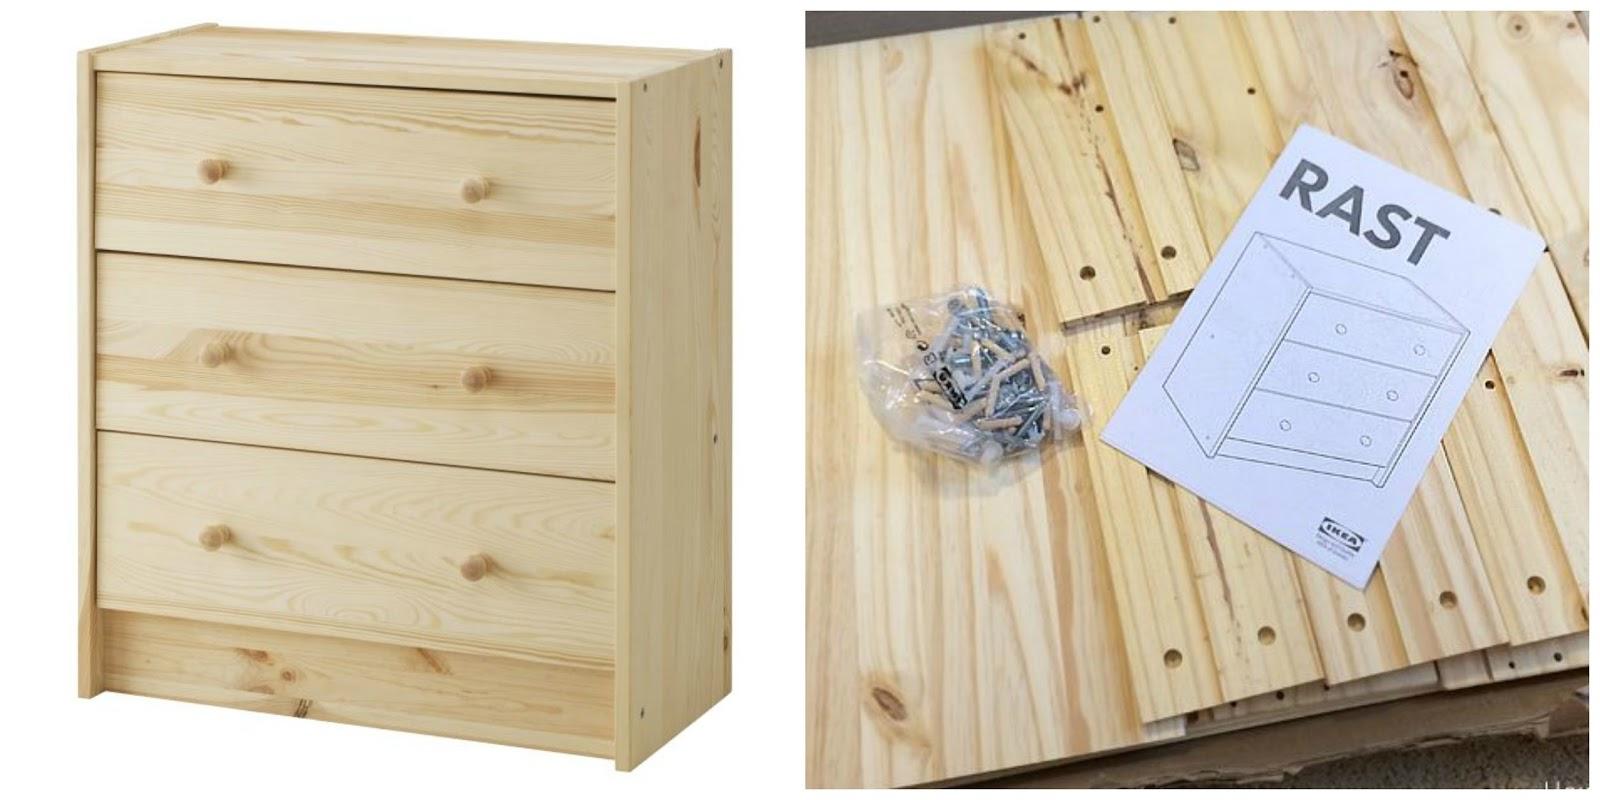 10 estupendas ideas para personalizar tu comoda rast de - Ikea mesillas y comodas ...